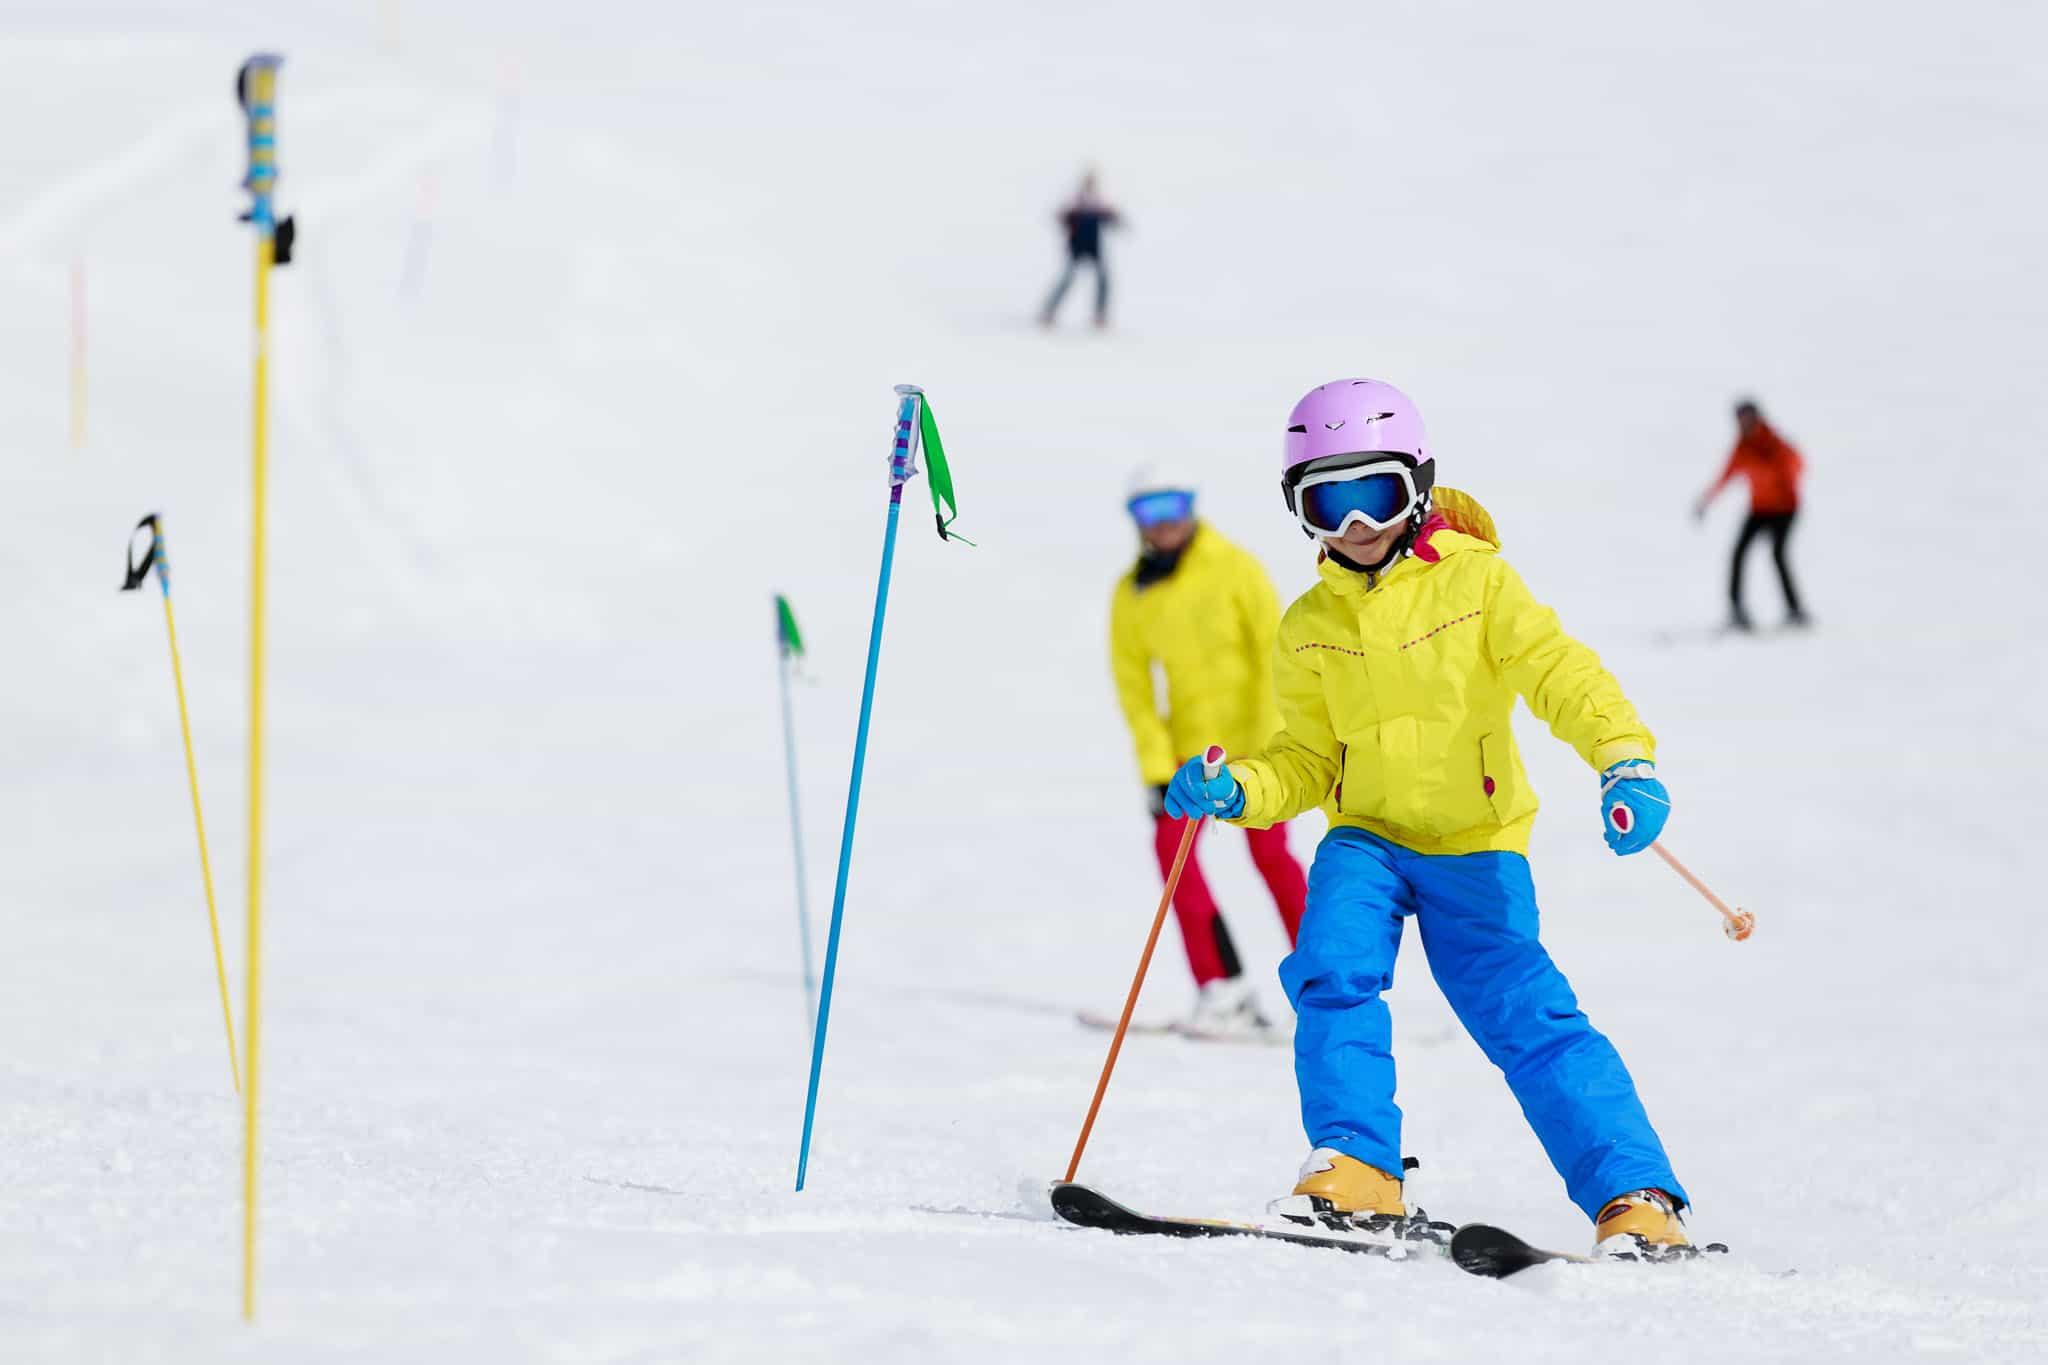 Ski famille pied des pistes